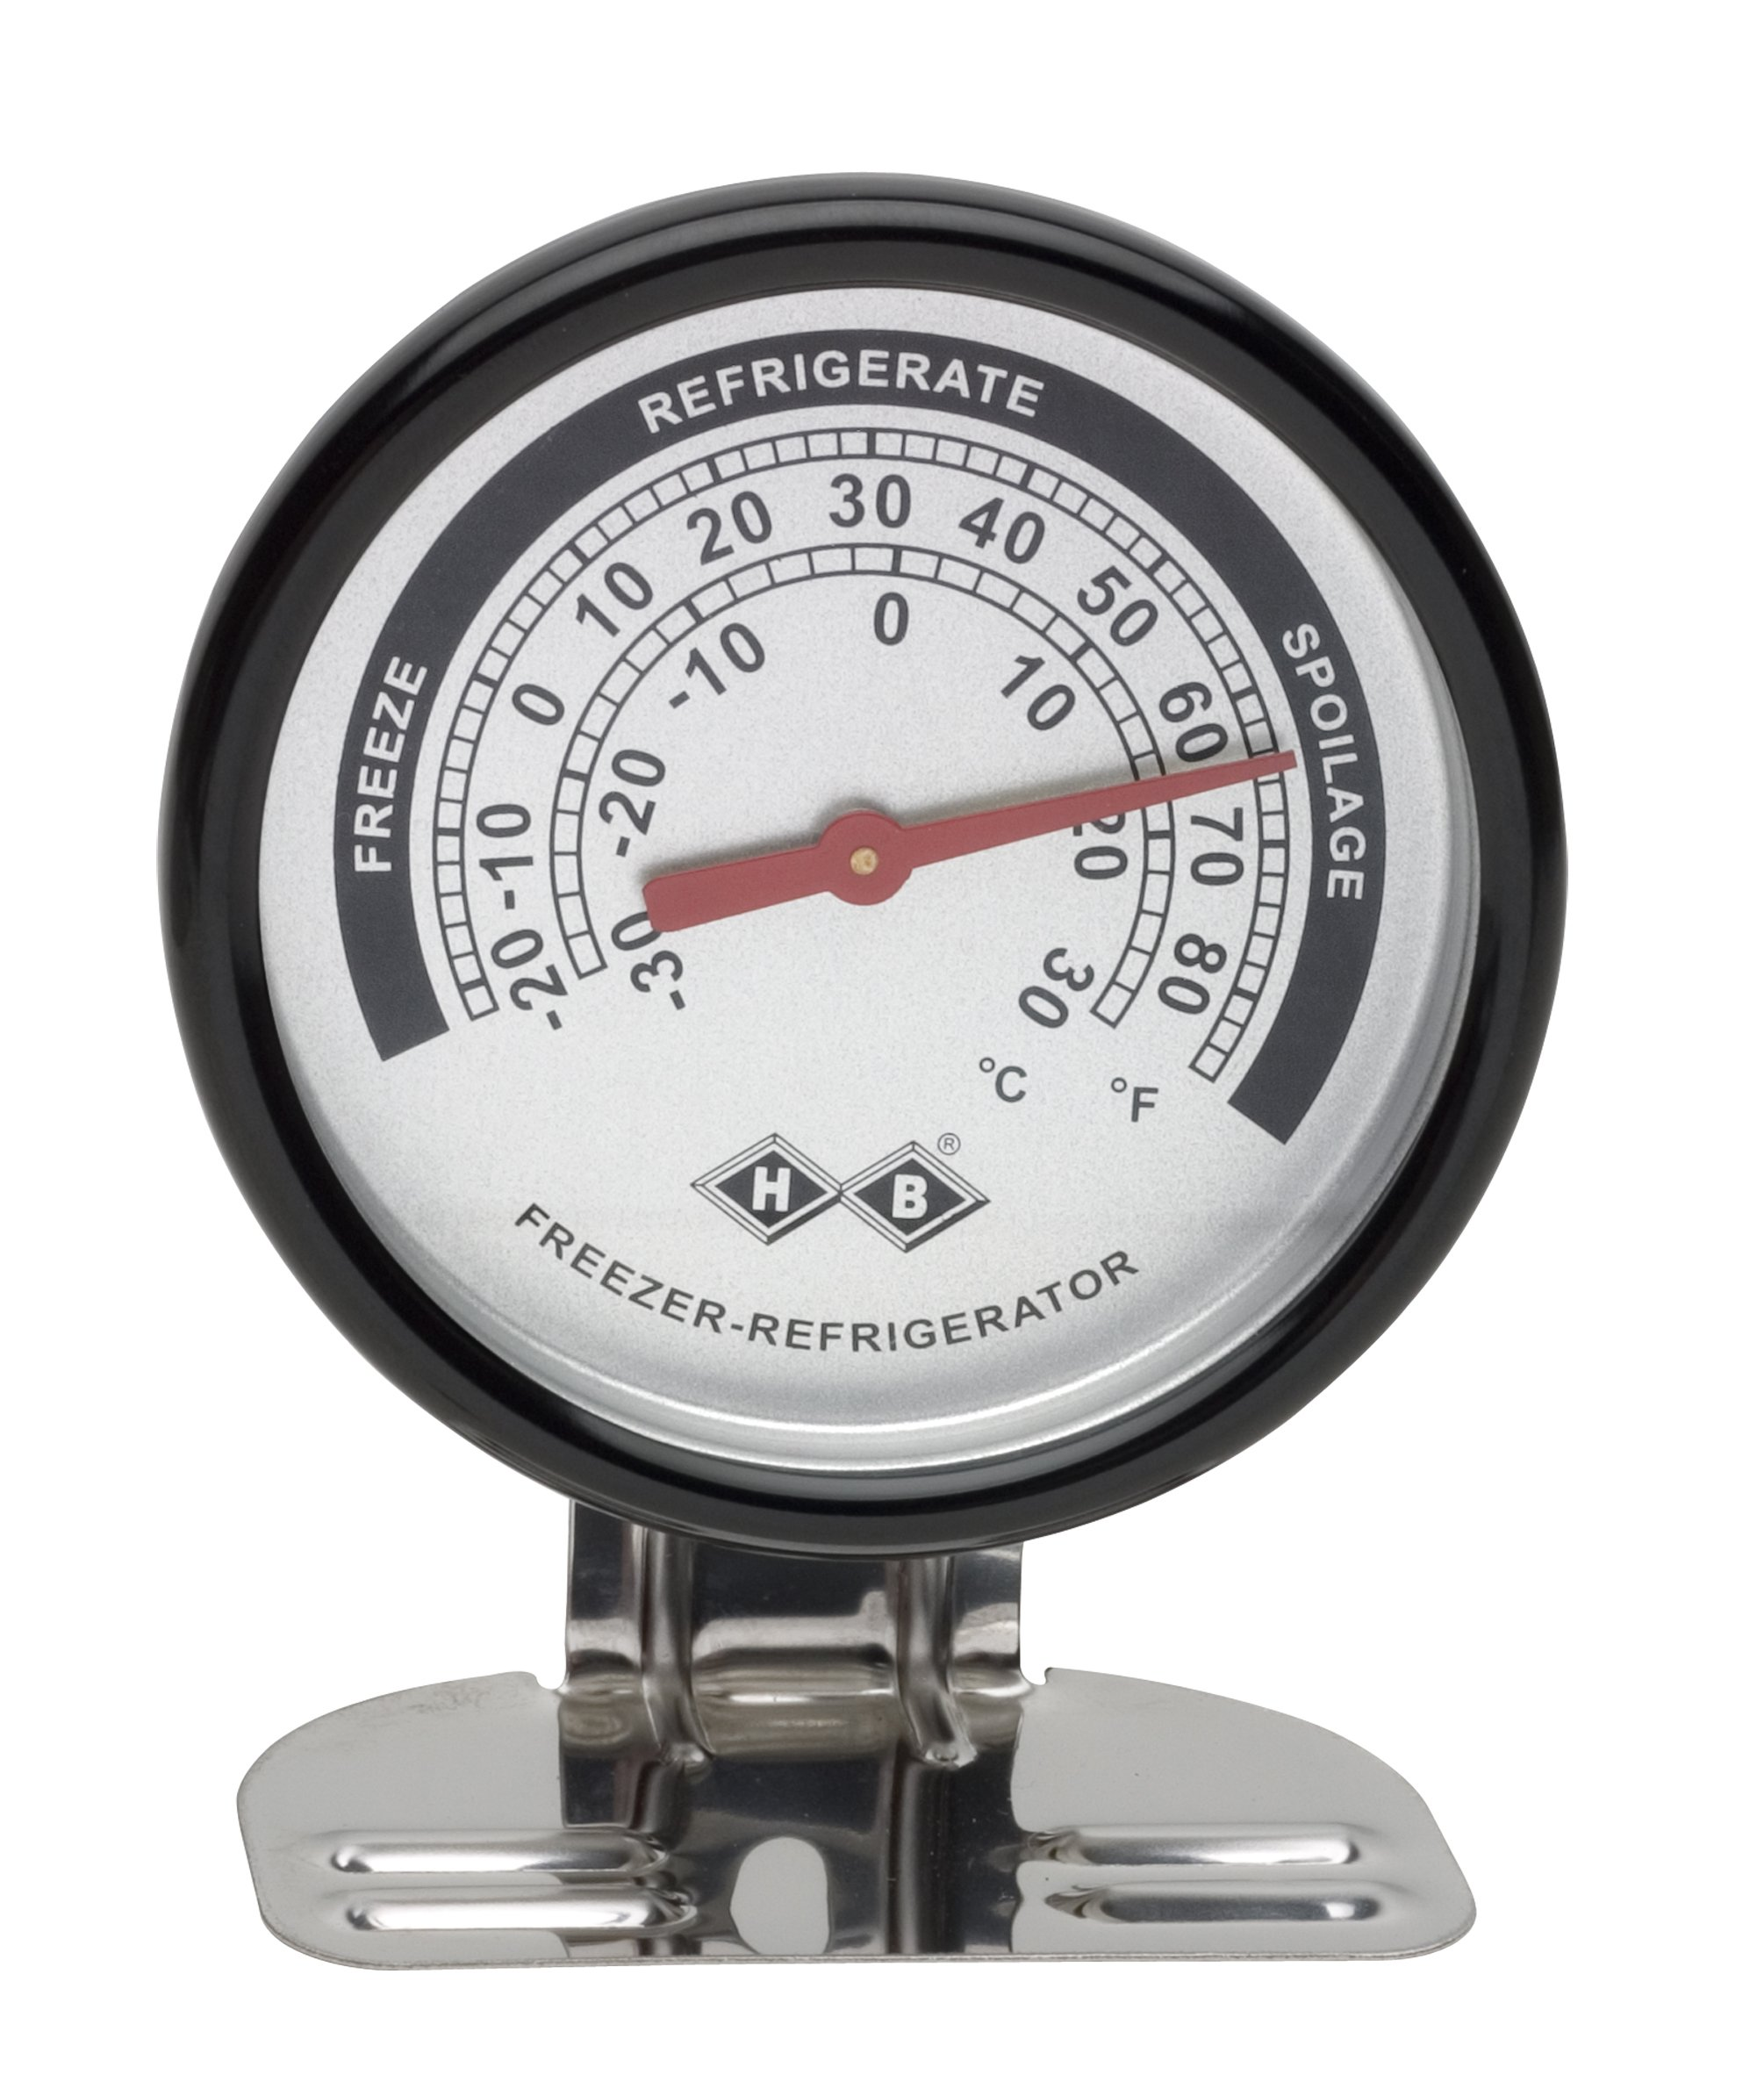 H-B DURAC Bi-Metallic Refrigerator/Freezer Thermometer; -30 to 30C (-20 to 80F); Stainless Steel Case (B61320-2100)